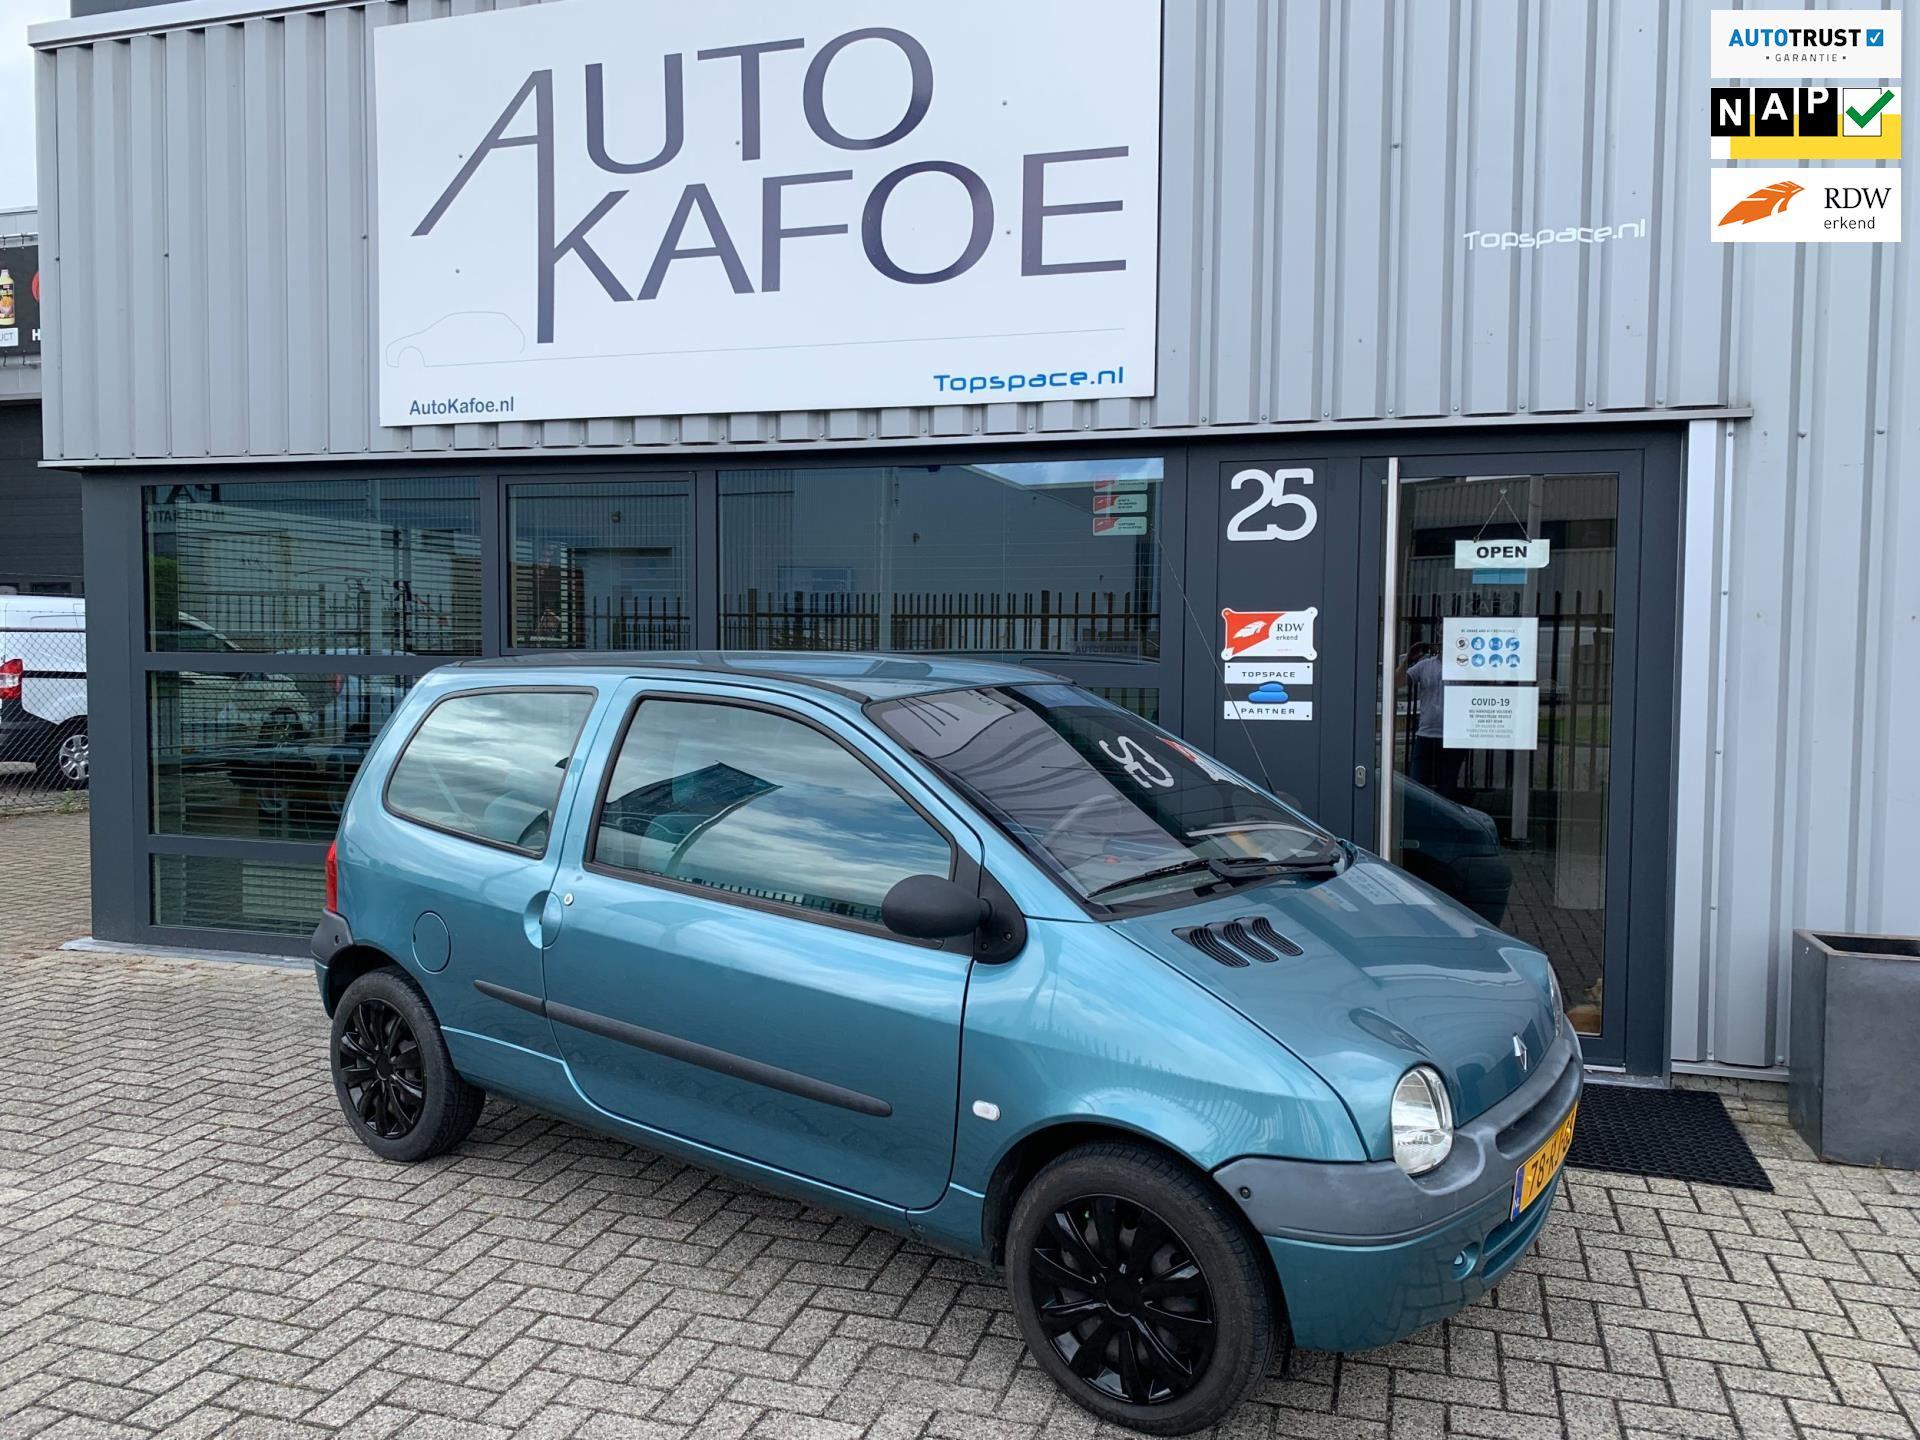 Renault Twingo occasion - AutoKafoe v.o.f.